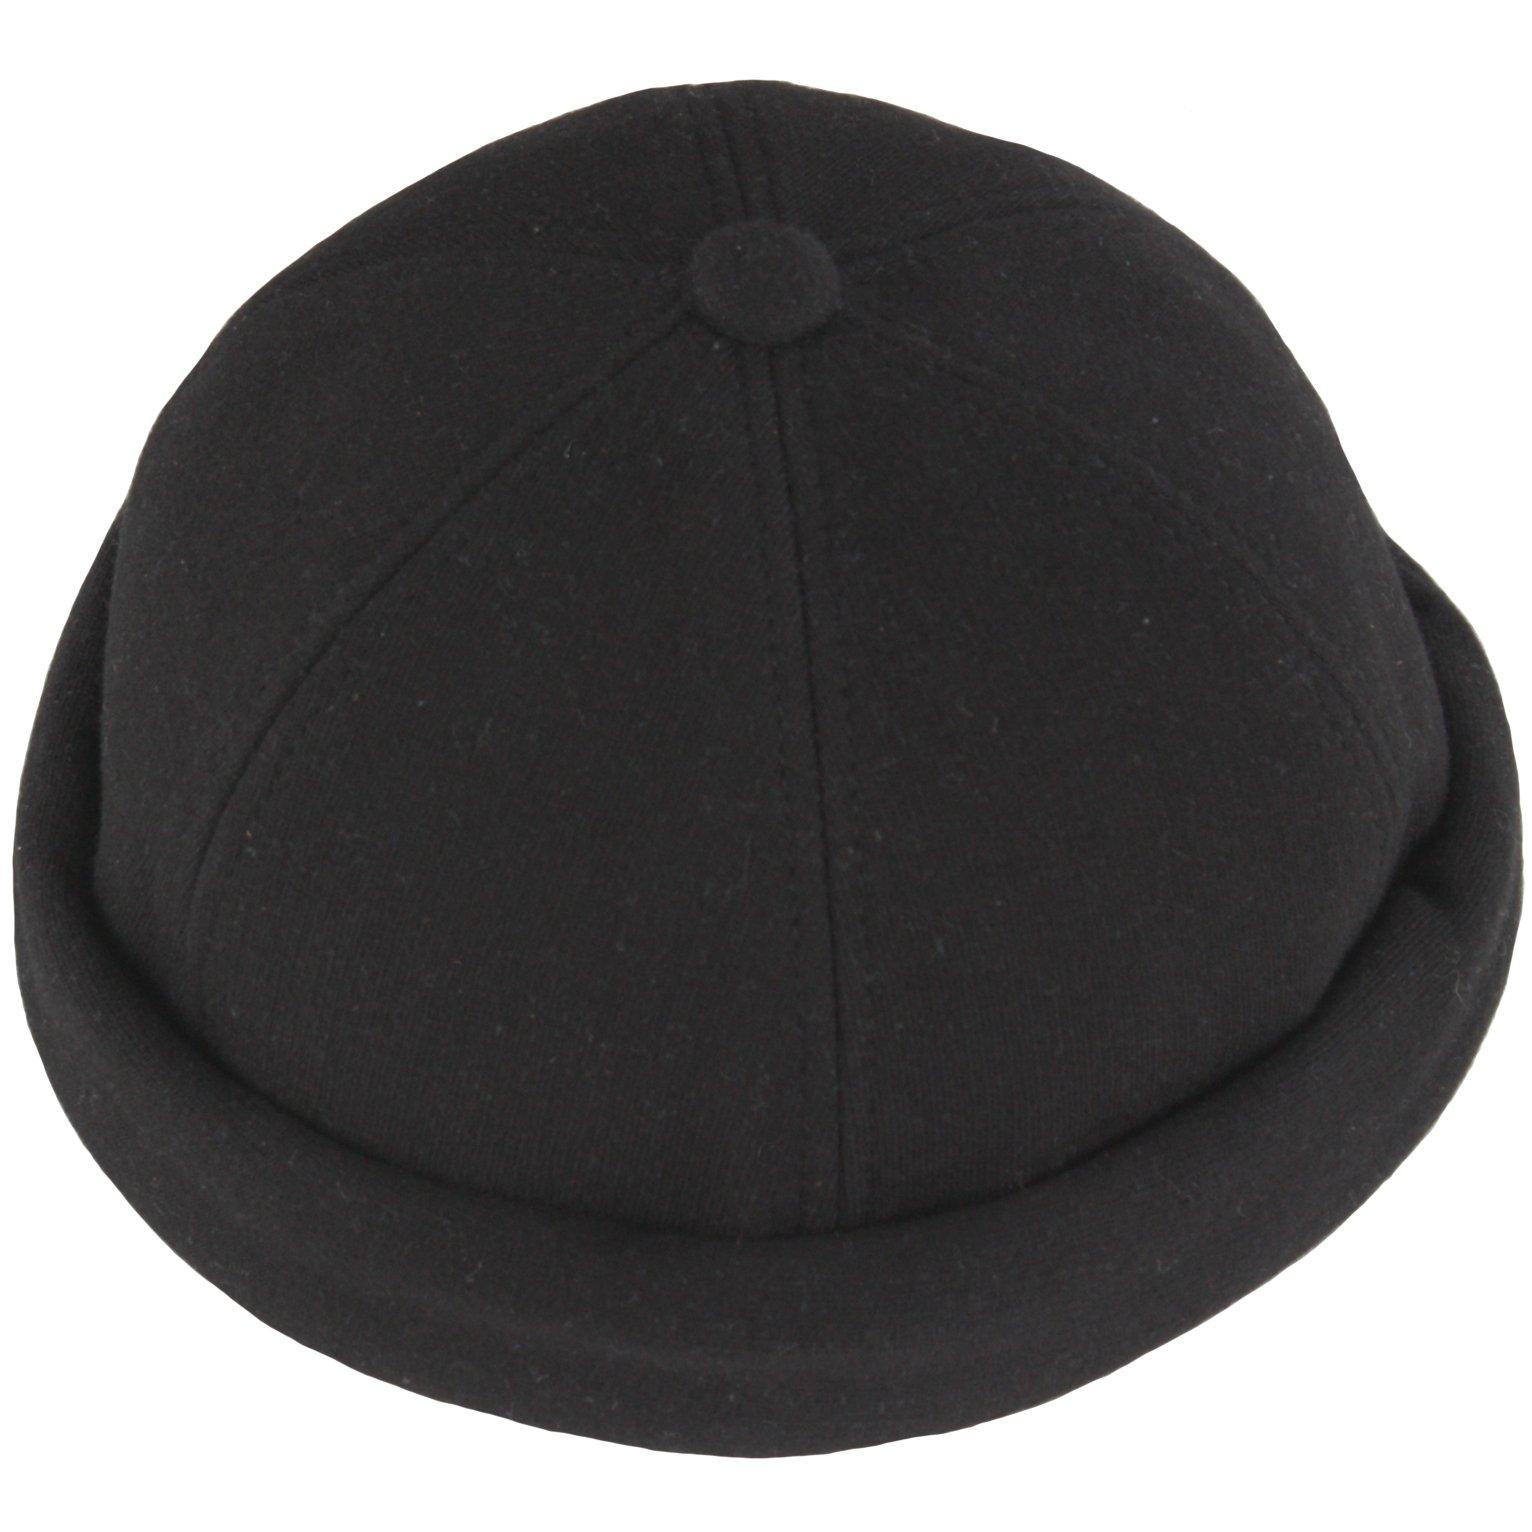 RaOn B215 Unisex Cotton Soft Style No Bill Design Club Ball Cap Baseball Hat Truckers (Black)